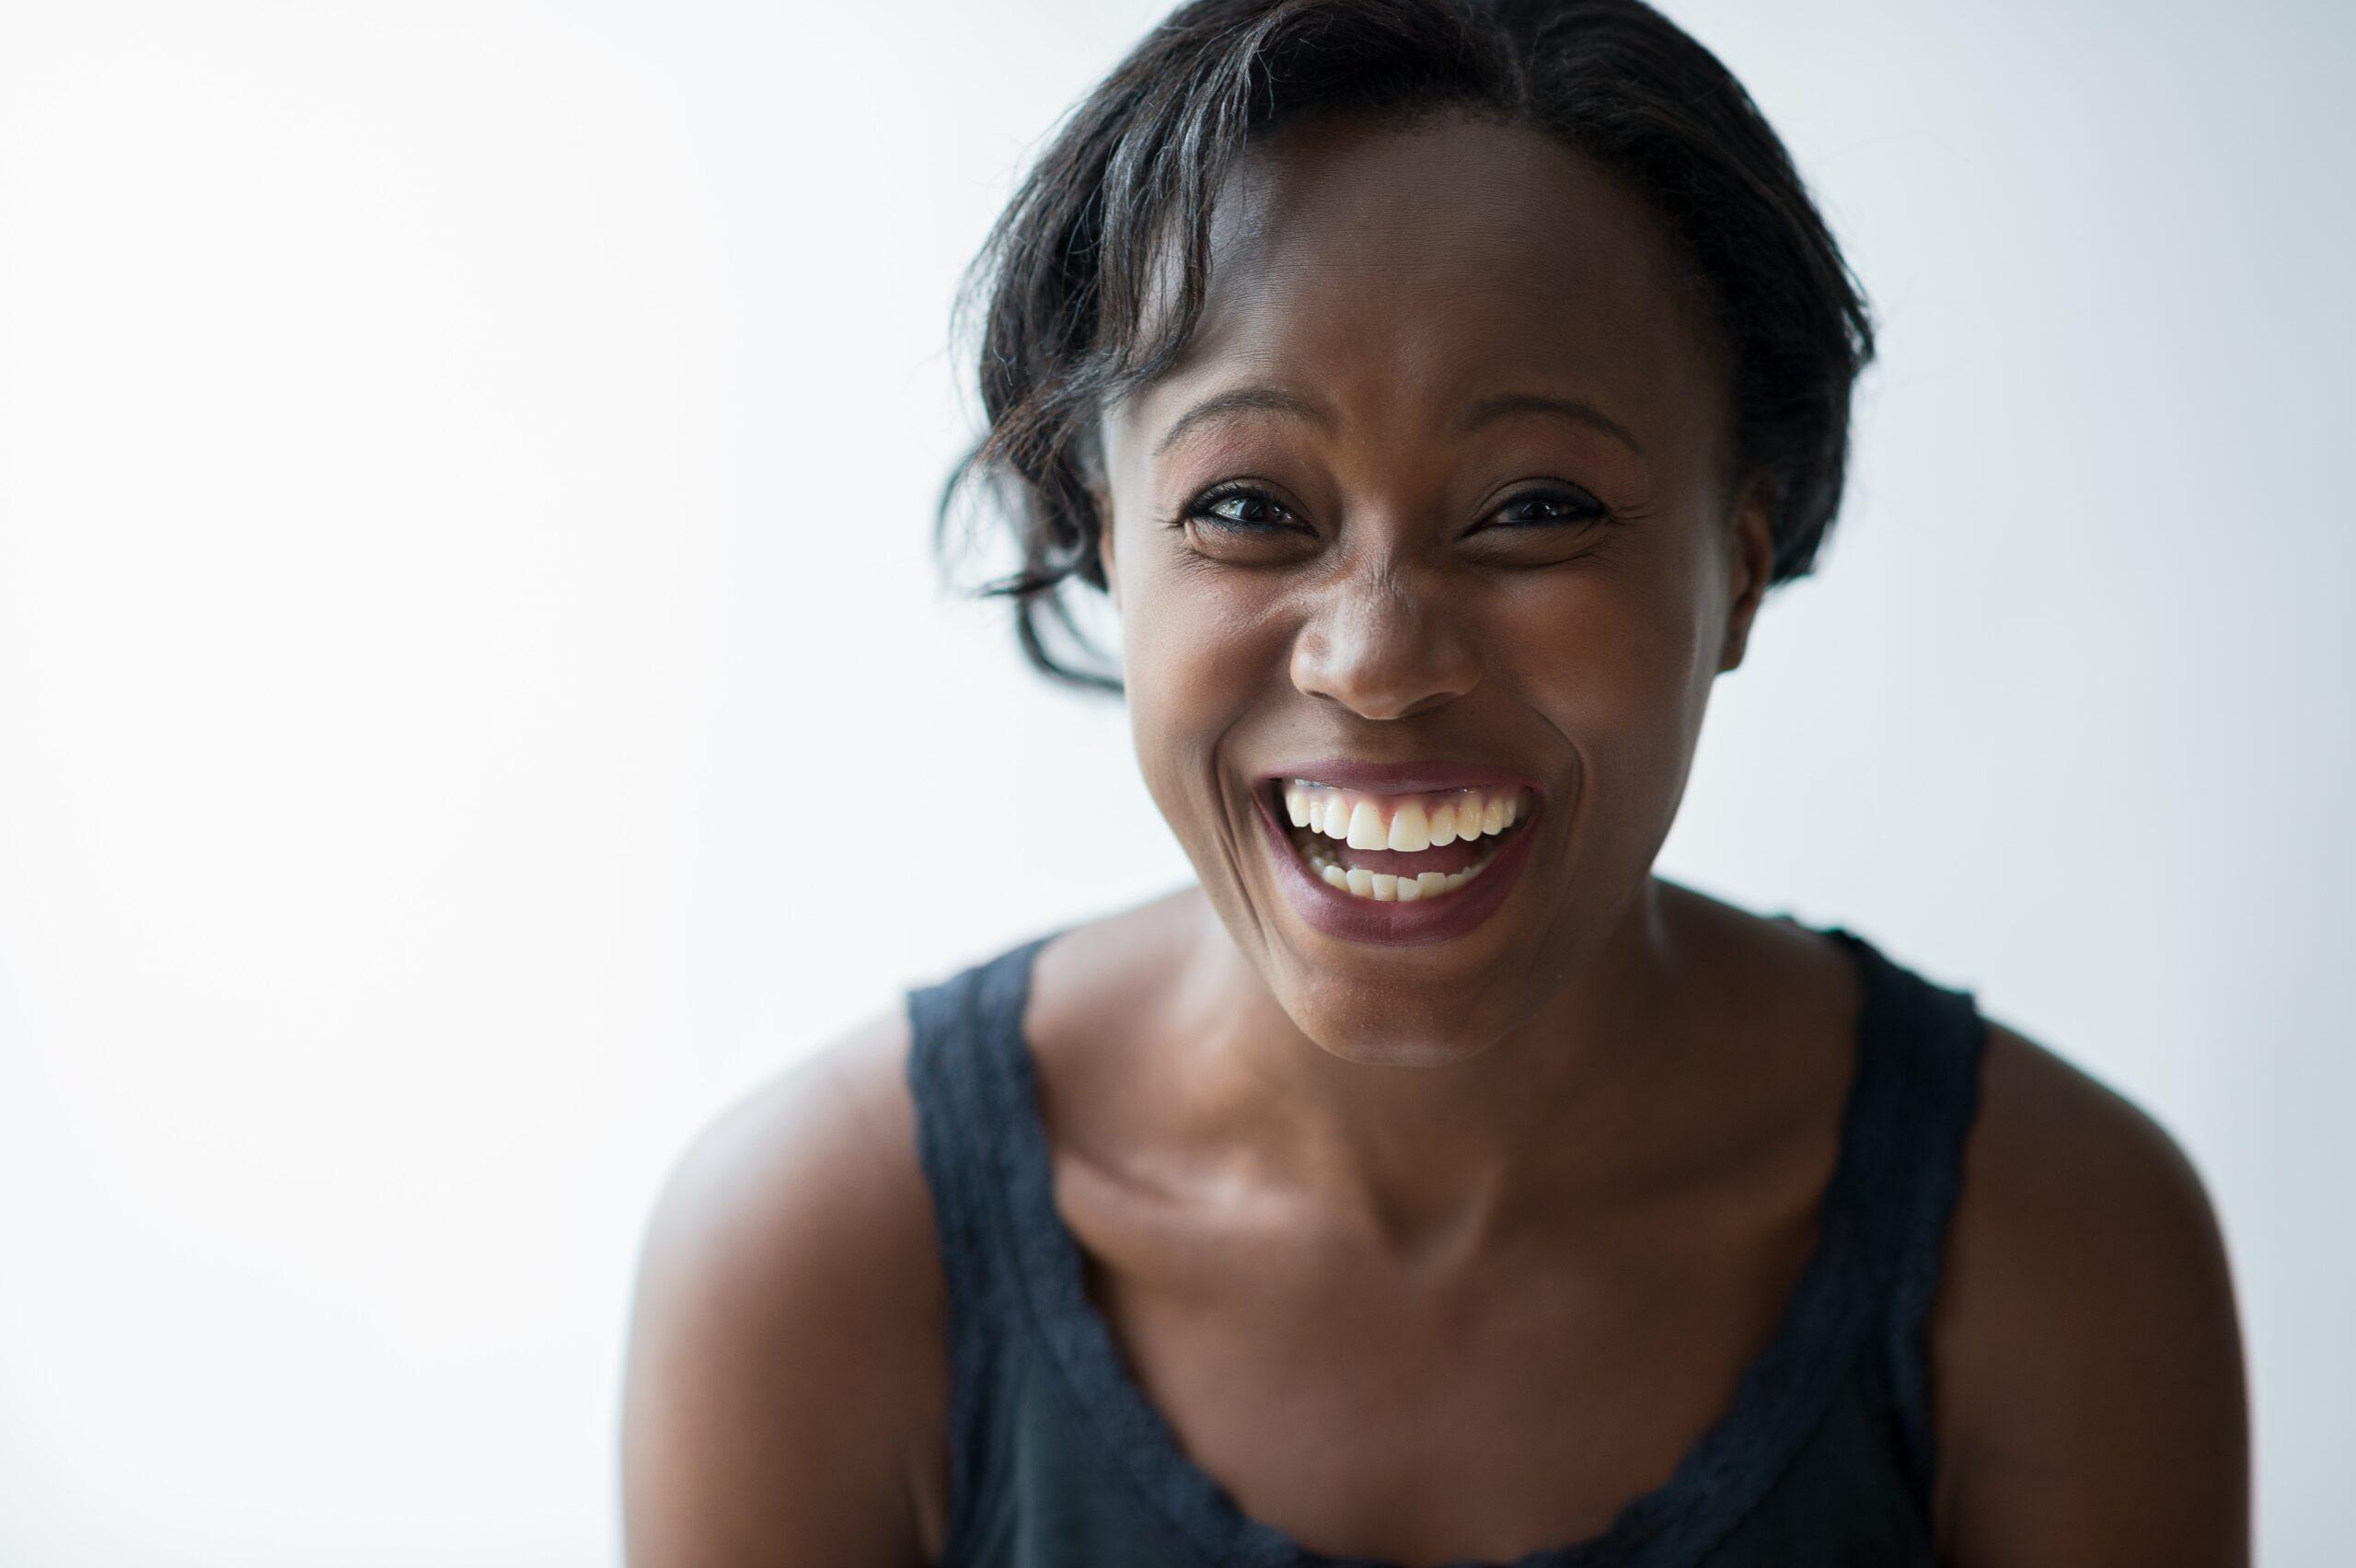 We Love Making You Smile | Houston Dentist